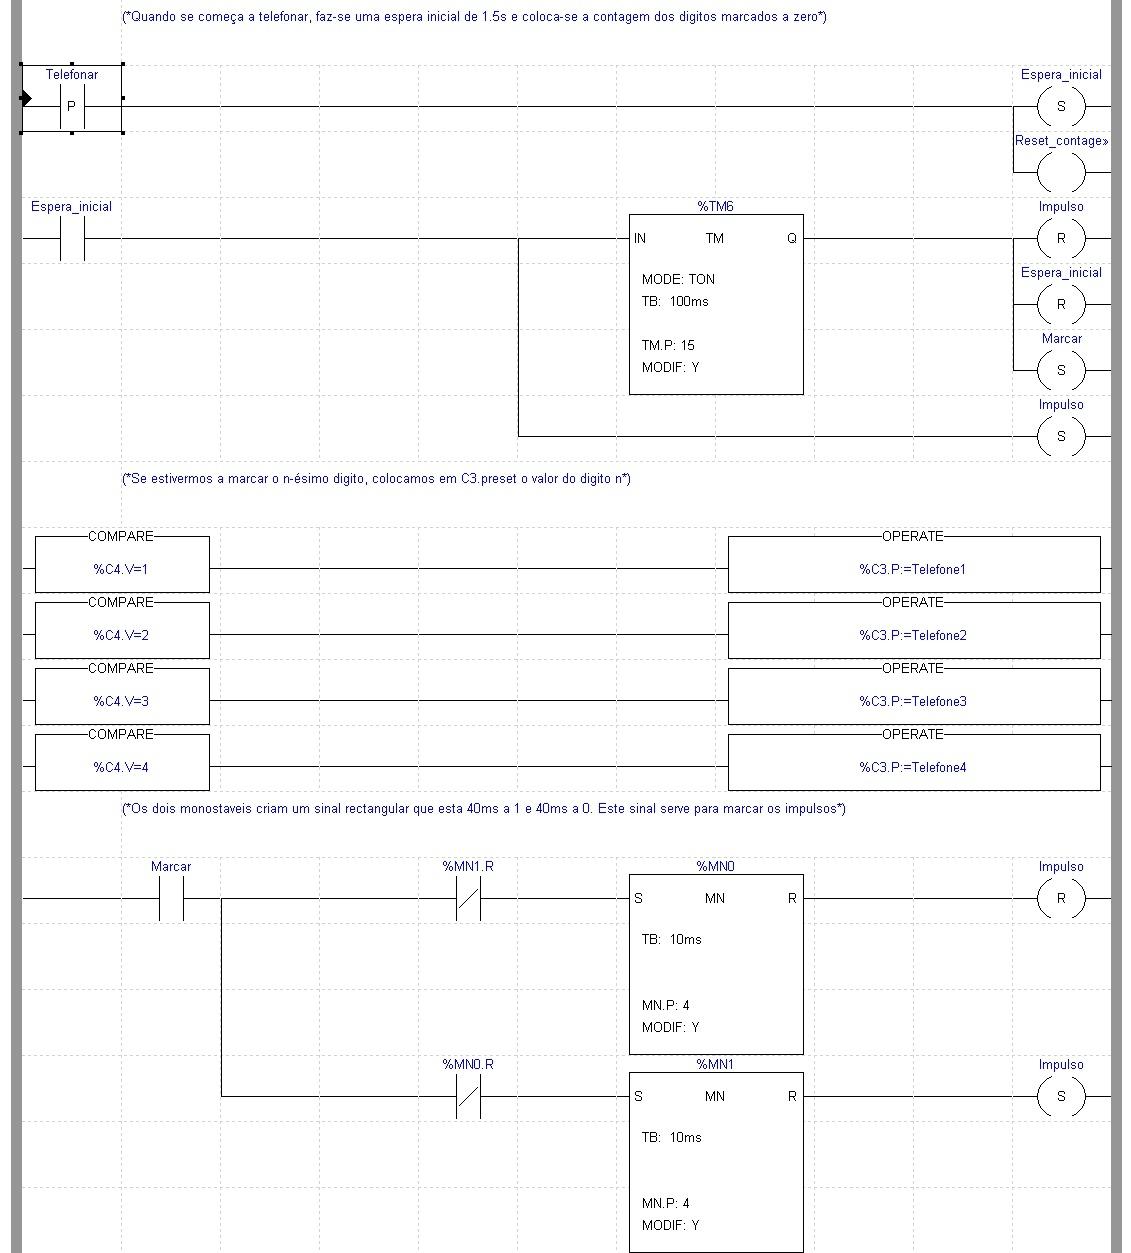 visual programming languages snapshots rh blog interfacevision com Major Language in India India Language or Numbers